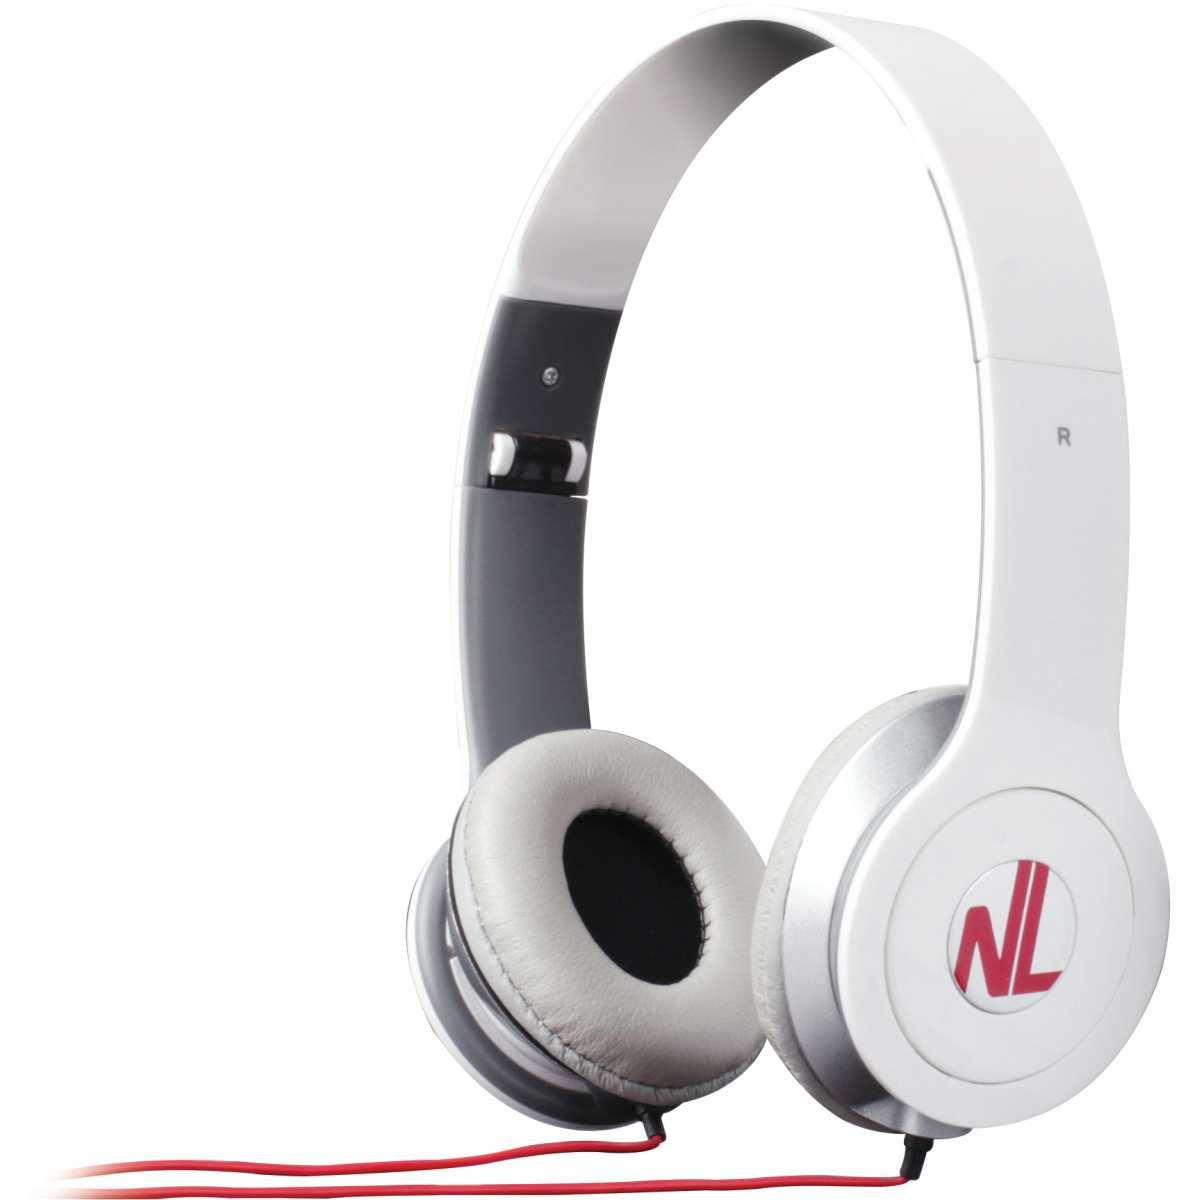 Fone de Ouvido - Extreme 15MW Dobravel Branco - Newex